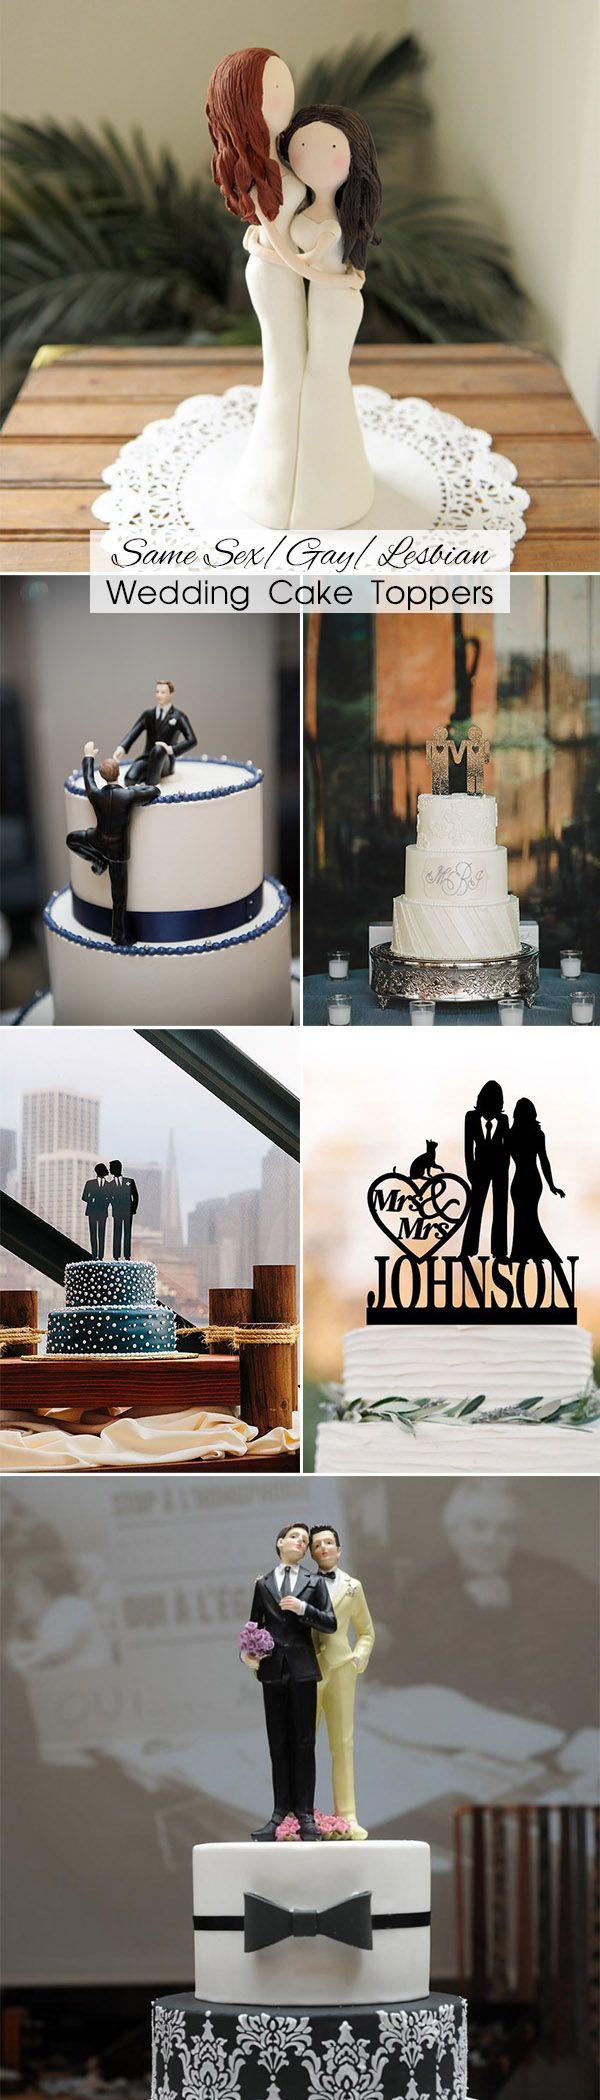 best wedding images on pinterest wedding ideas wedding